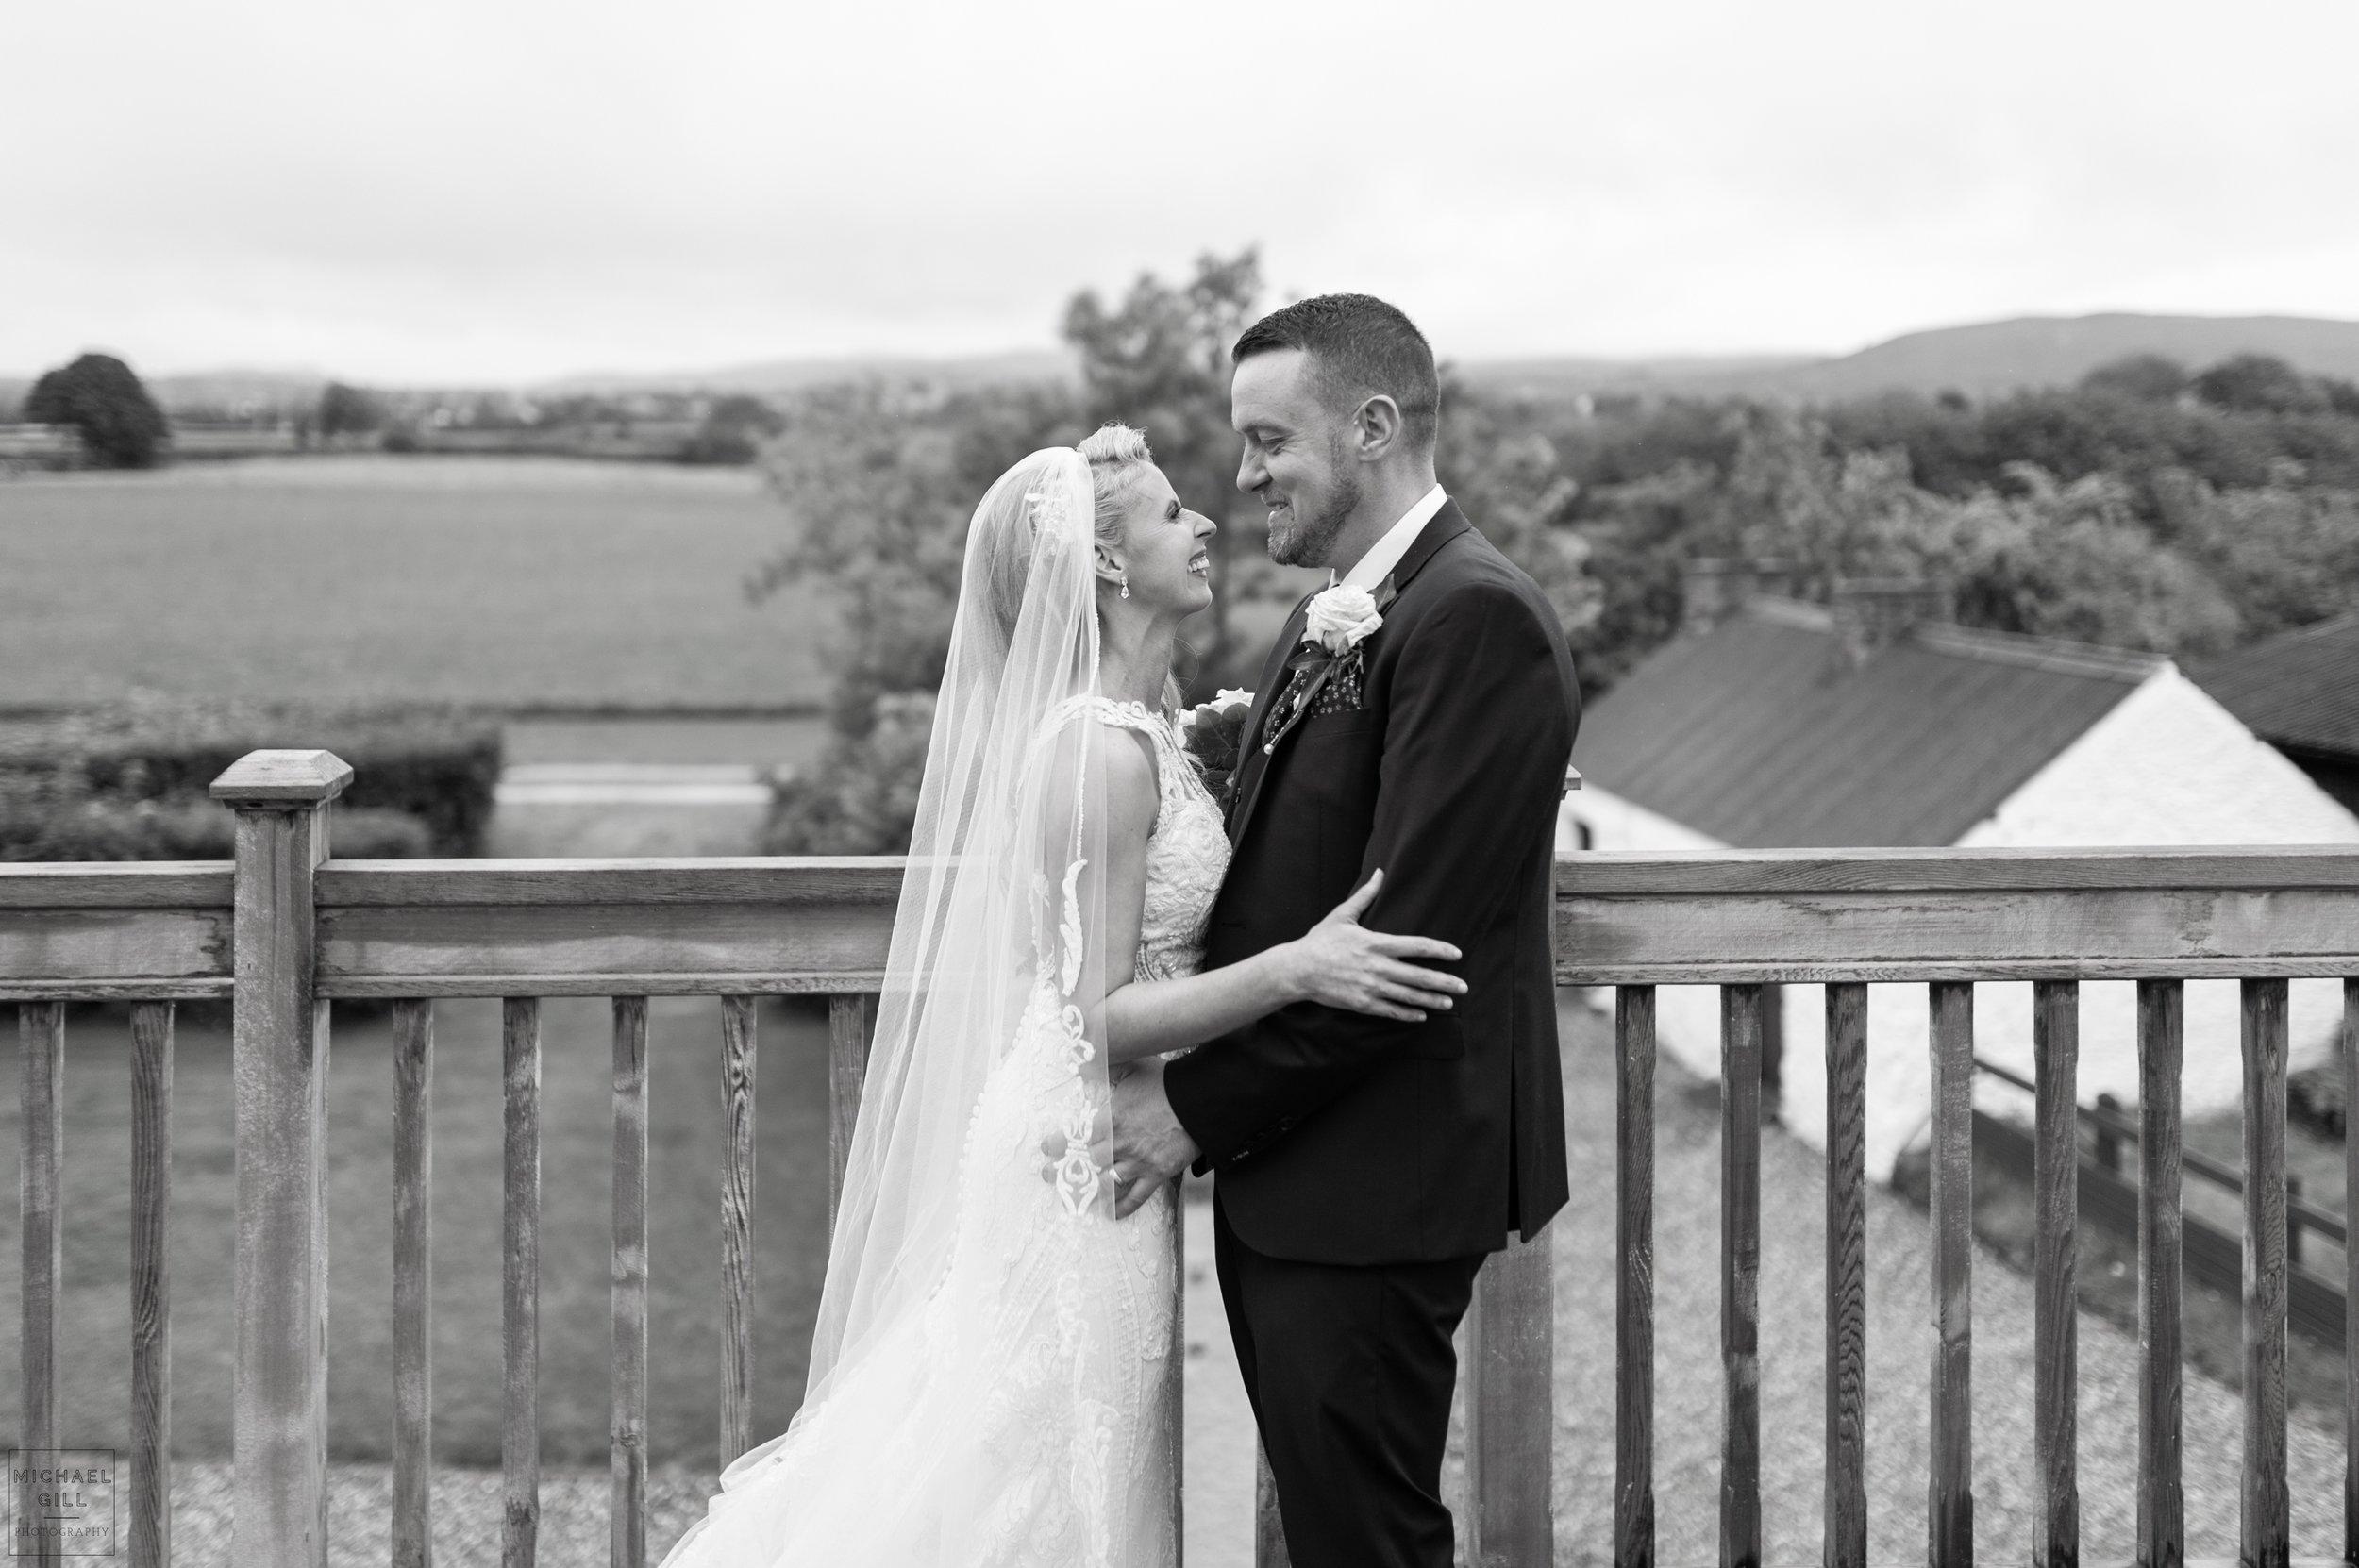 Michael_Gill_Photography_Wedding_Ballyliffin009.JPG